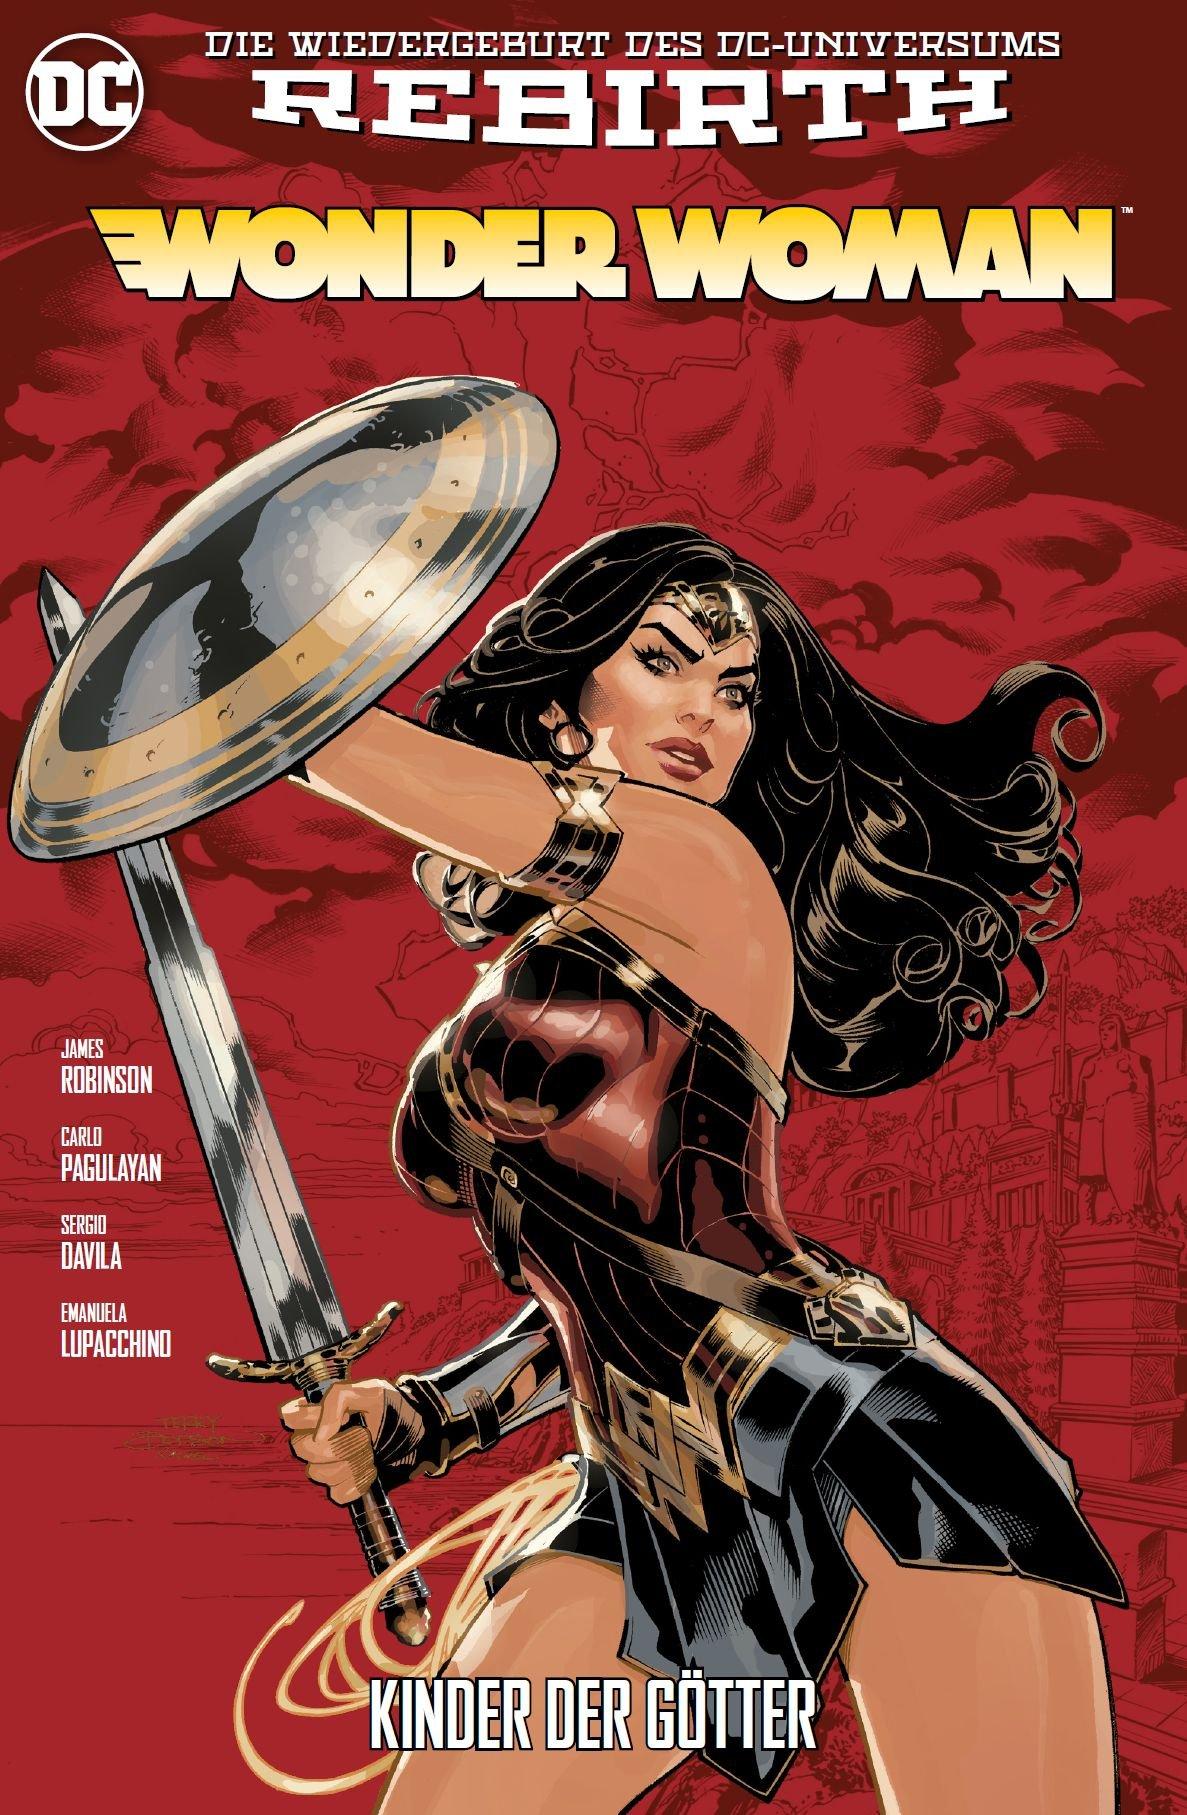 Wonder Woman: Bd. 5 (2. Serie): Kinder der Götter Taschenbuch – 10. Juli 2018 James Dale Robinson Sergio Fernandez Davila Emanuela Lupacchino Carlo Pagulayan